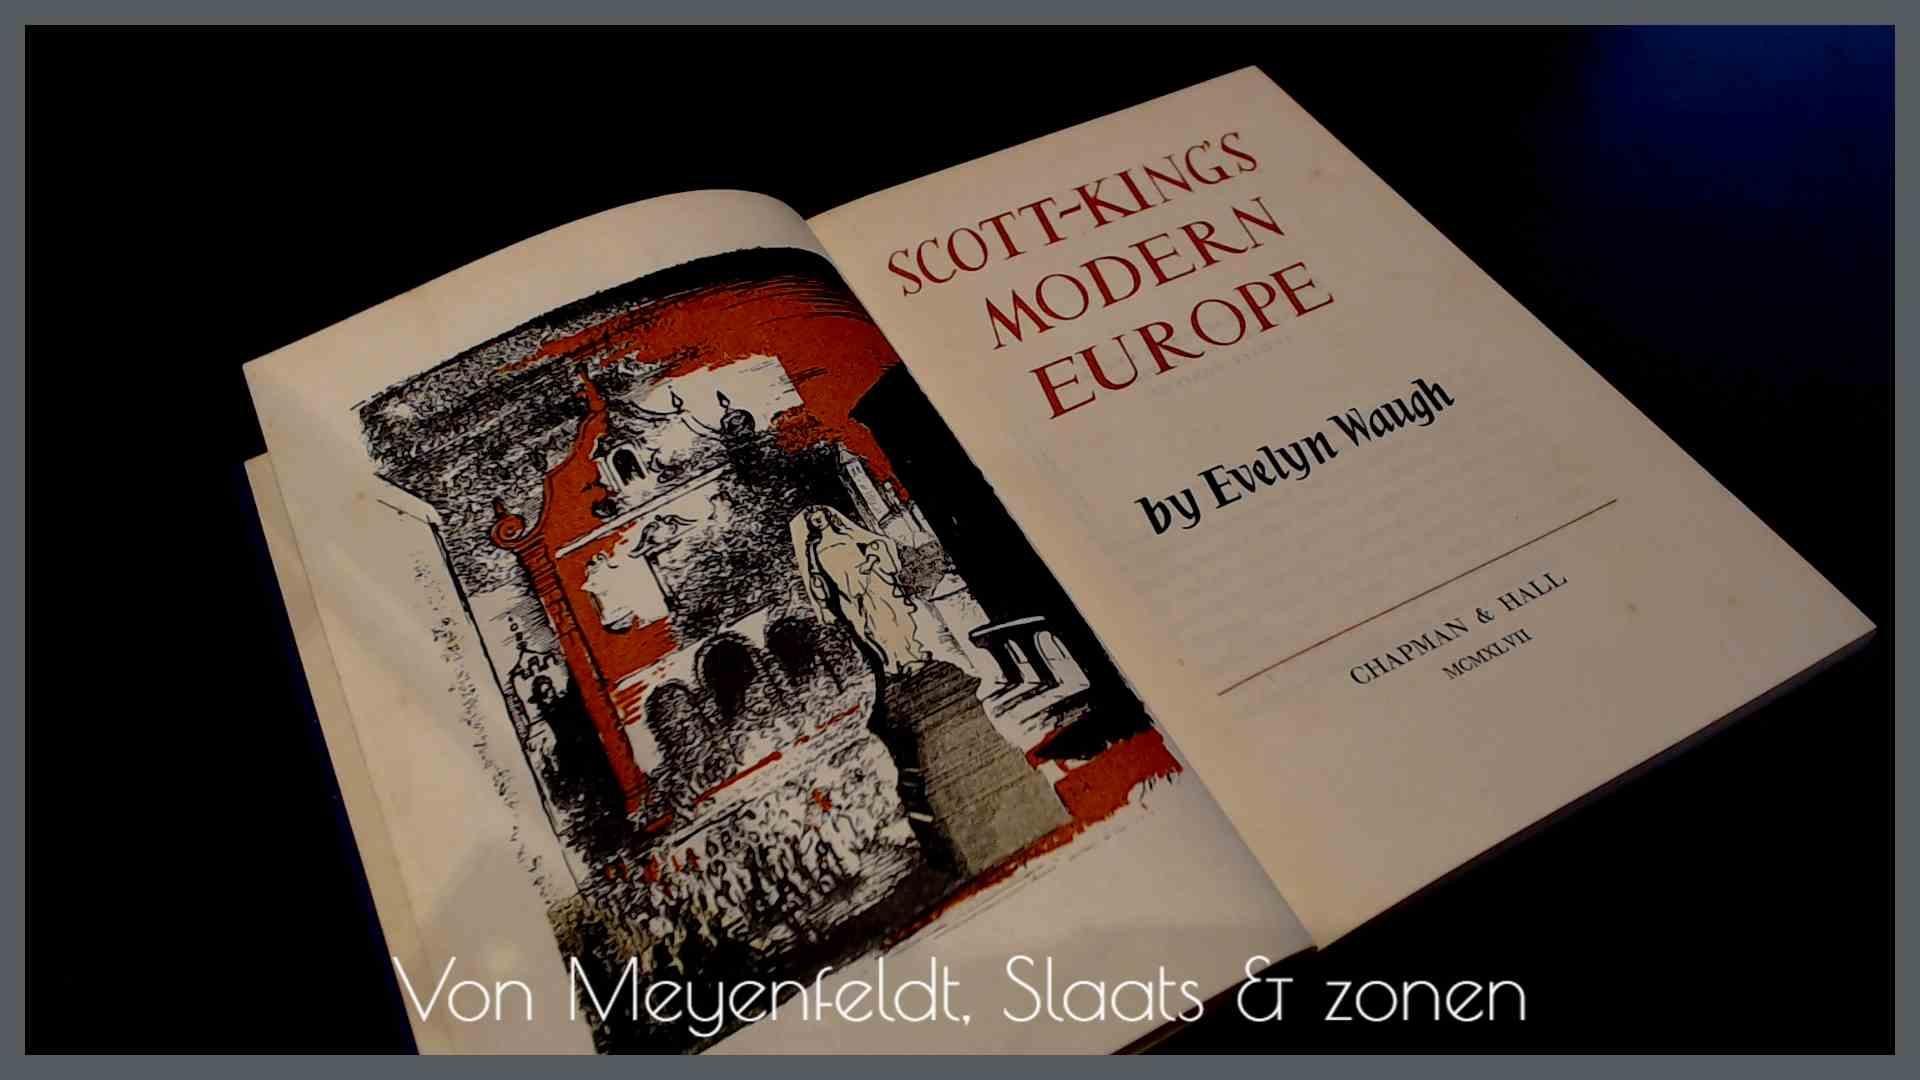 WAUGH, EVELYN - Scott-King's modern Europe